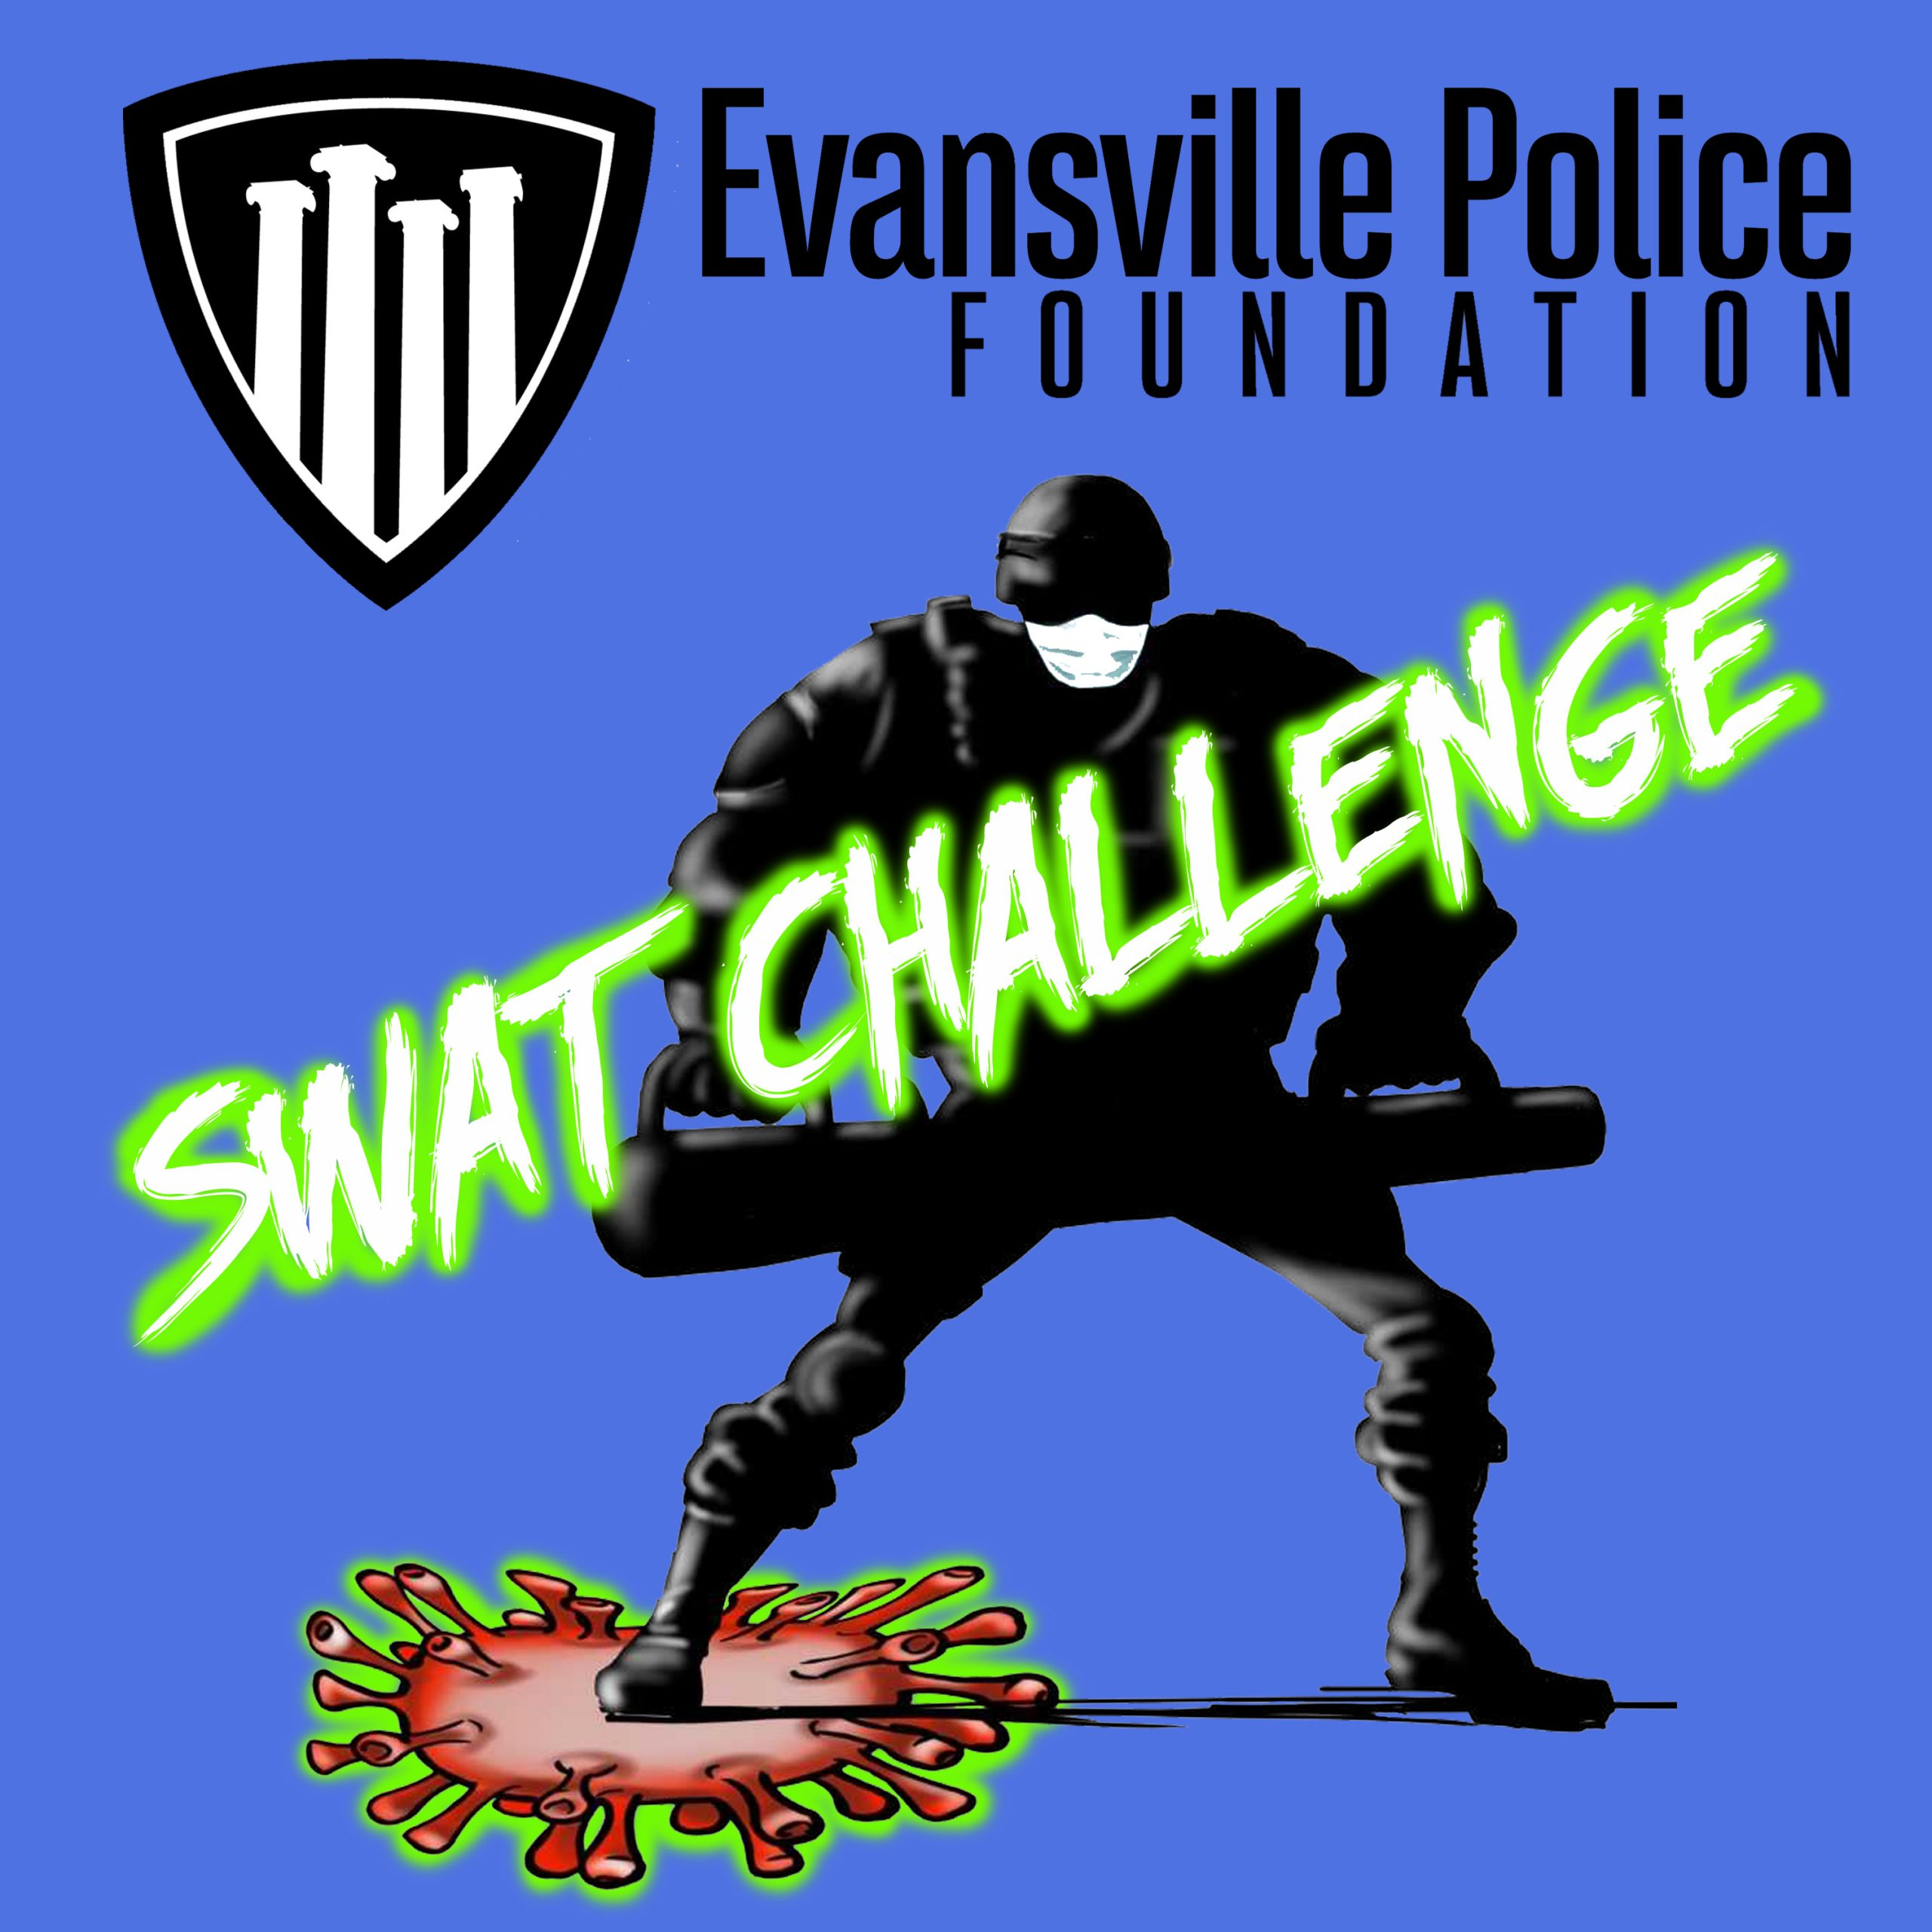 2020 SWAT CHALLENGE T-Shirt Design